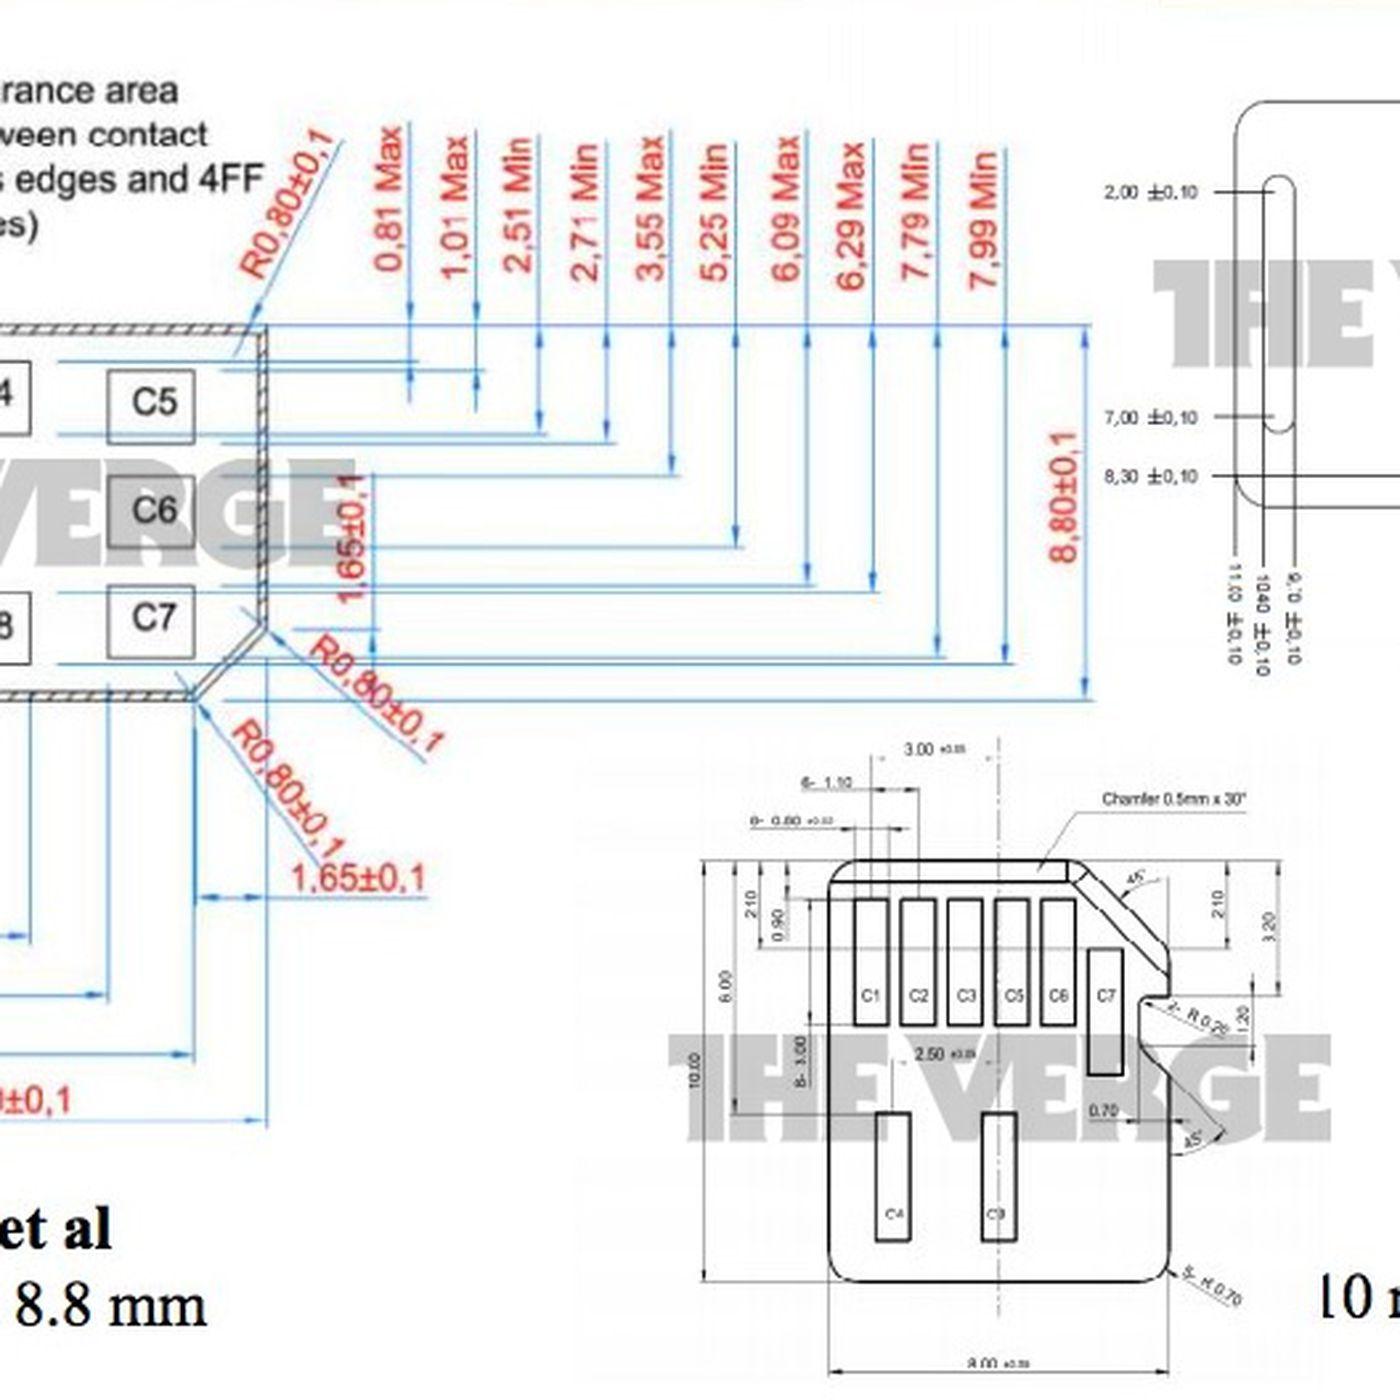 Nokia Acknowledges Nano Sim Decision Now Says Its Prepared To X Circuit Diagram License Essential Patents The Verge